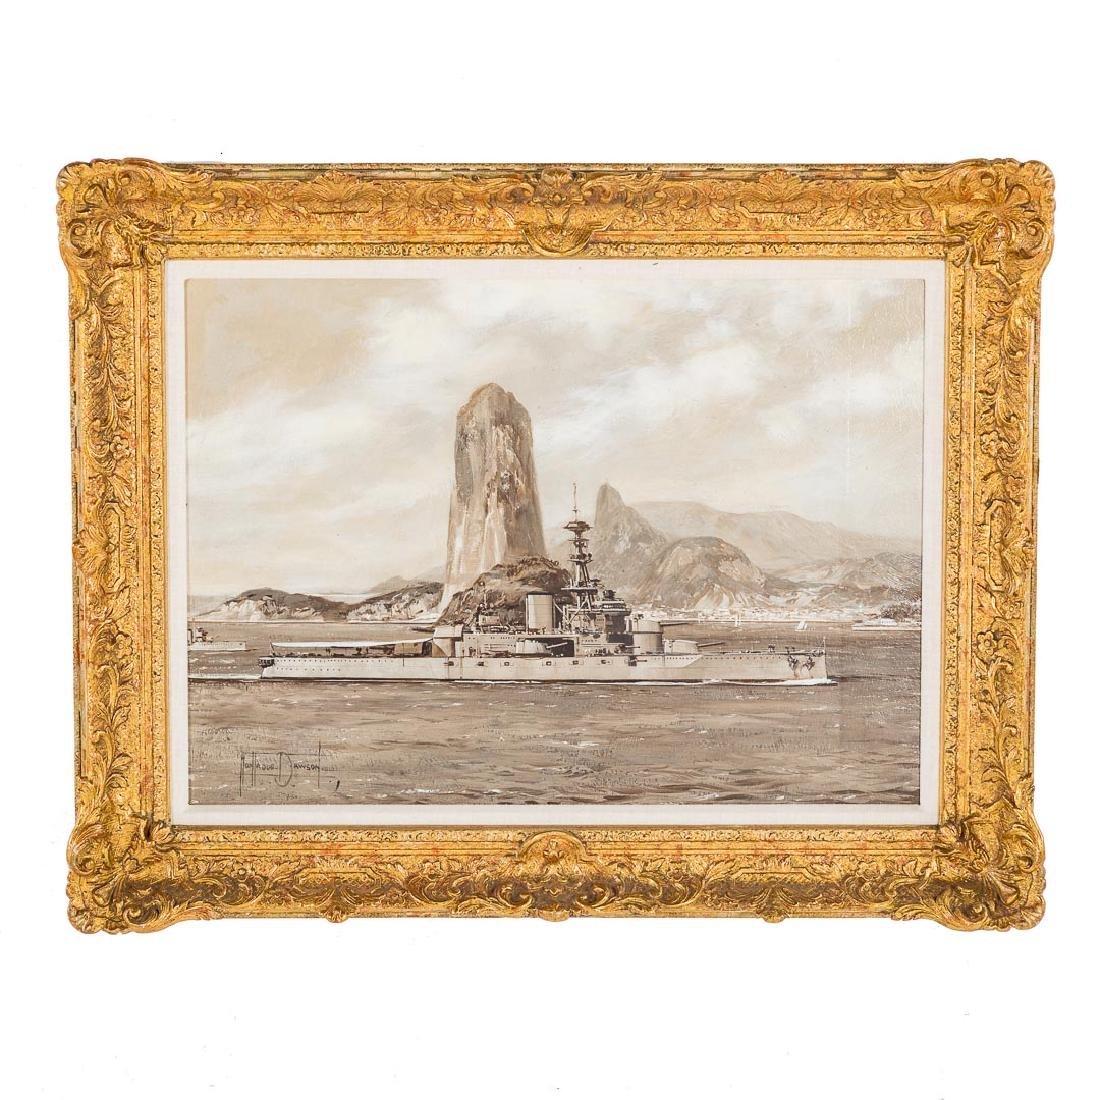 Montague Dawson. British Destroyer-Rio de Janeiro